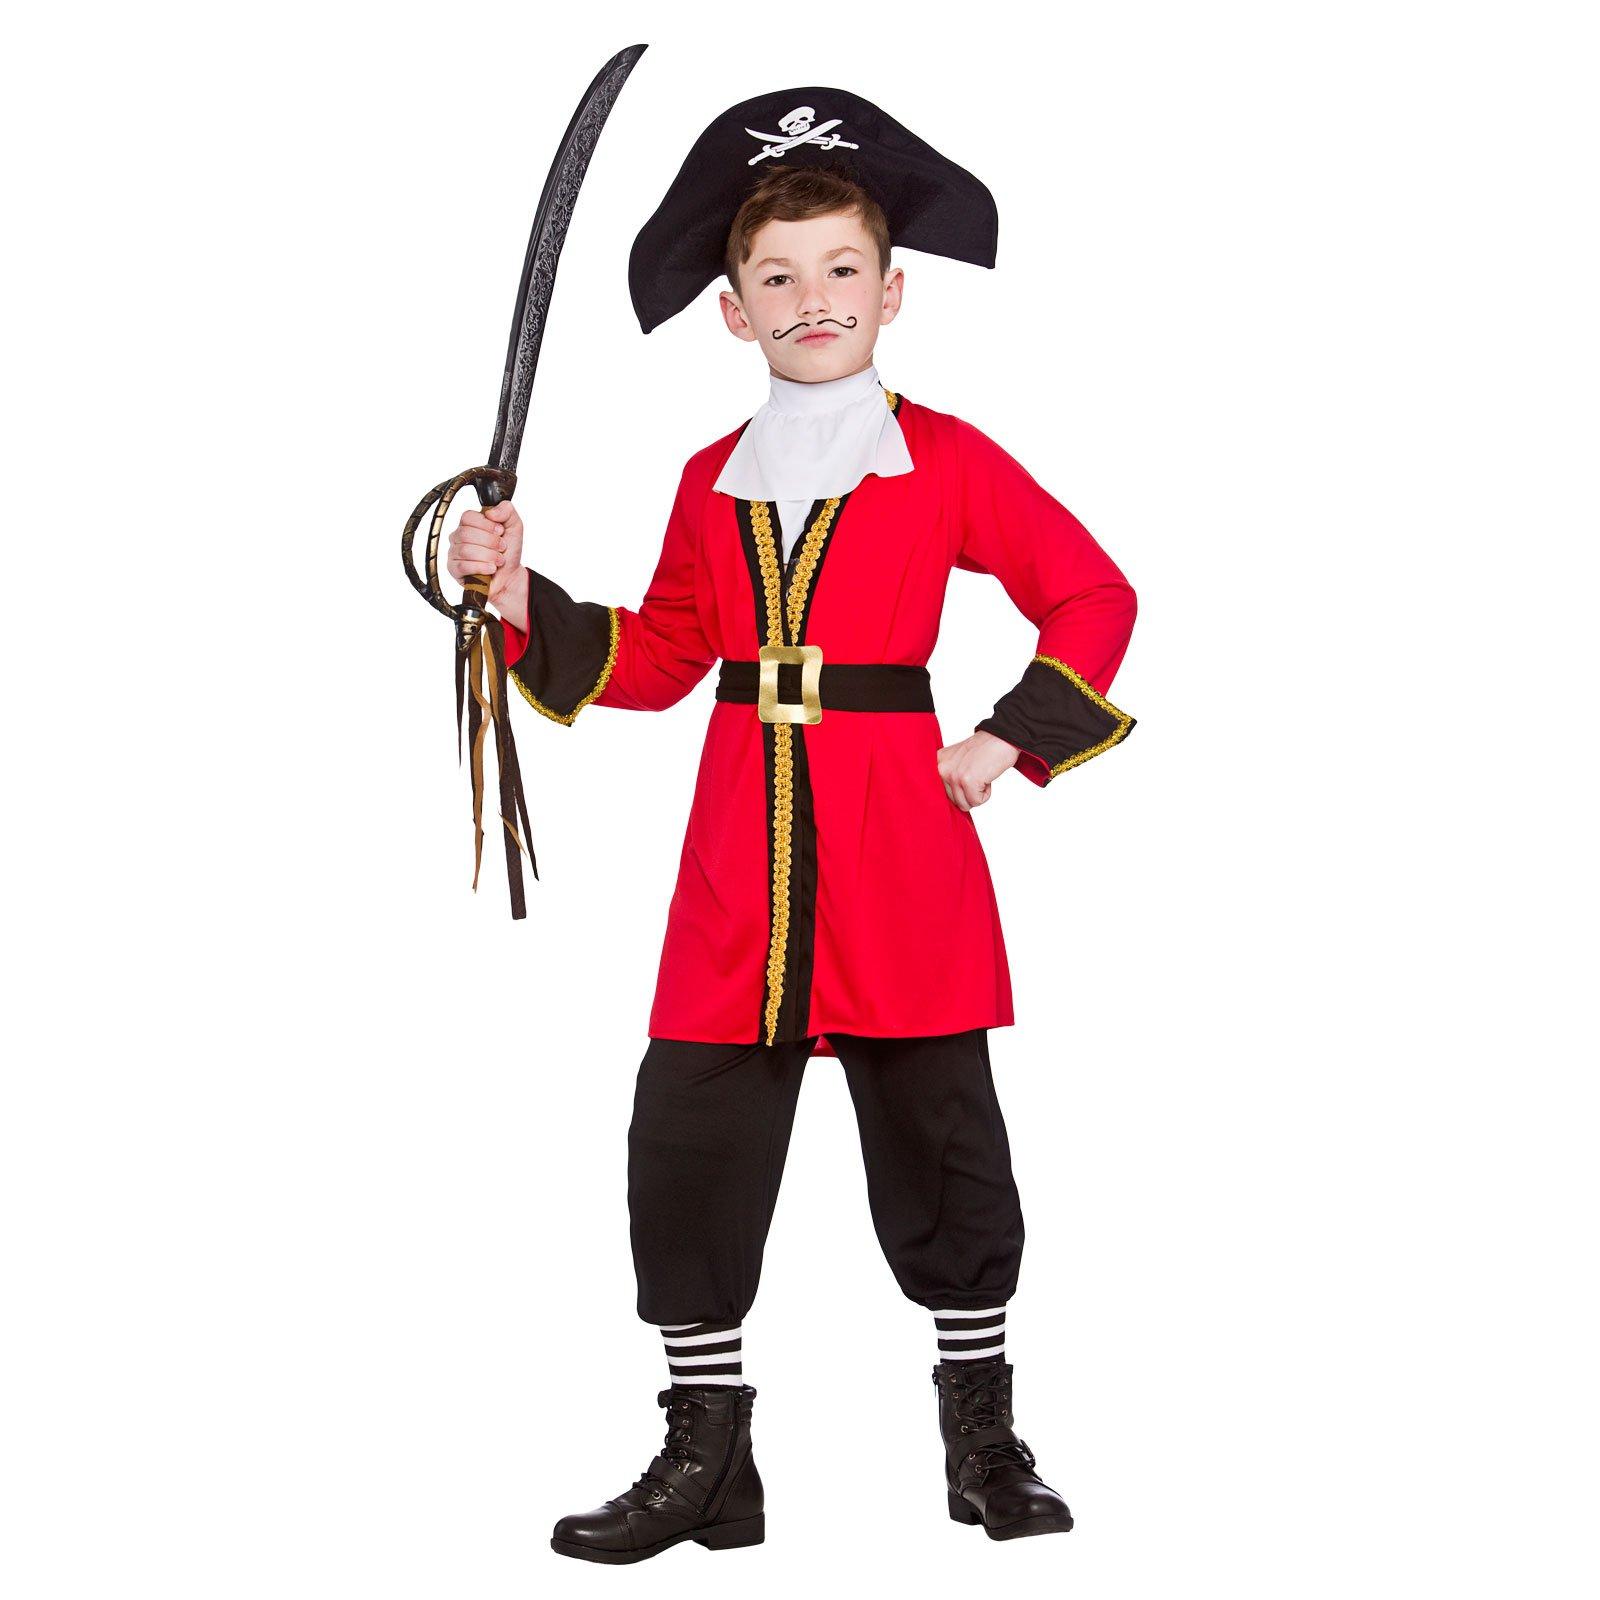 Pirate Captain - Kids Costume 5 - 7 years  sc 1 st  Amazon UK & Kids Pirate Costume: Amazon.co.uk